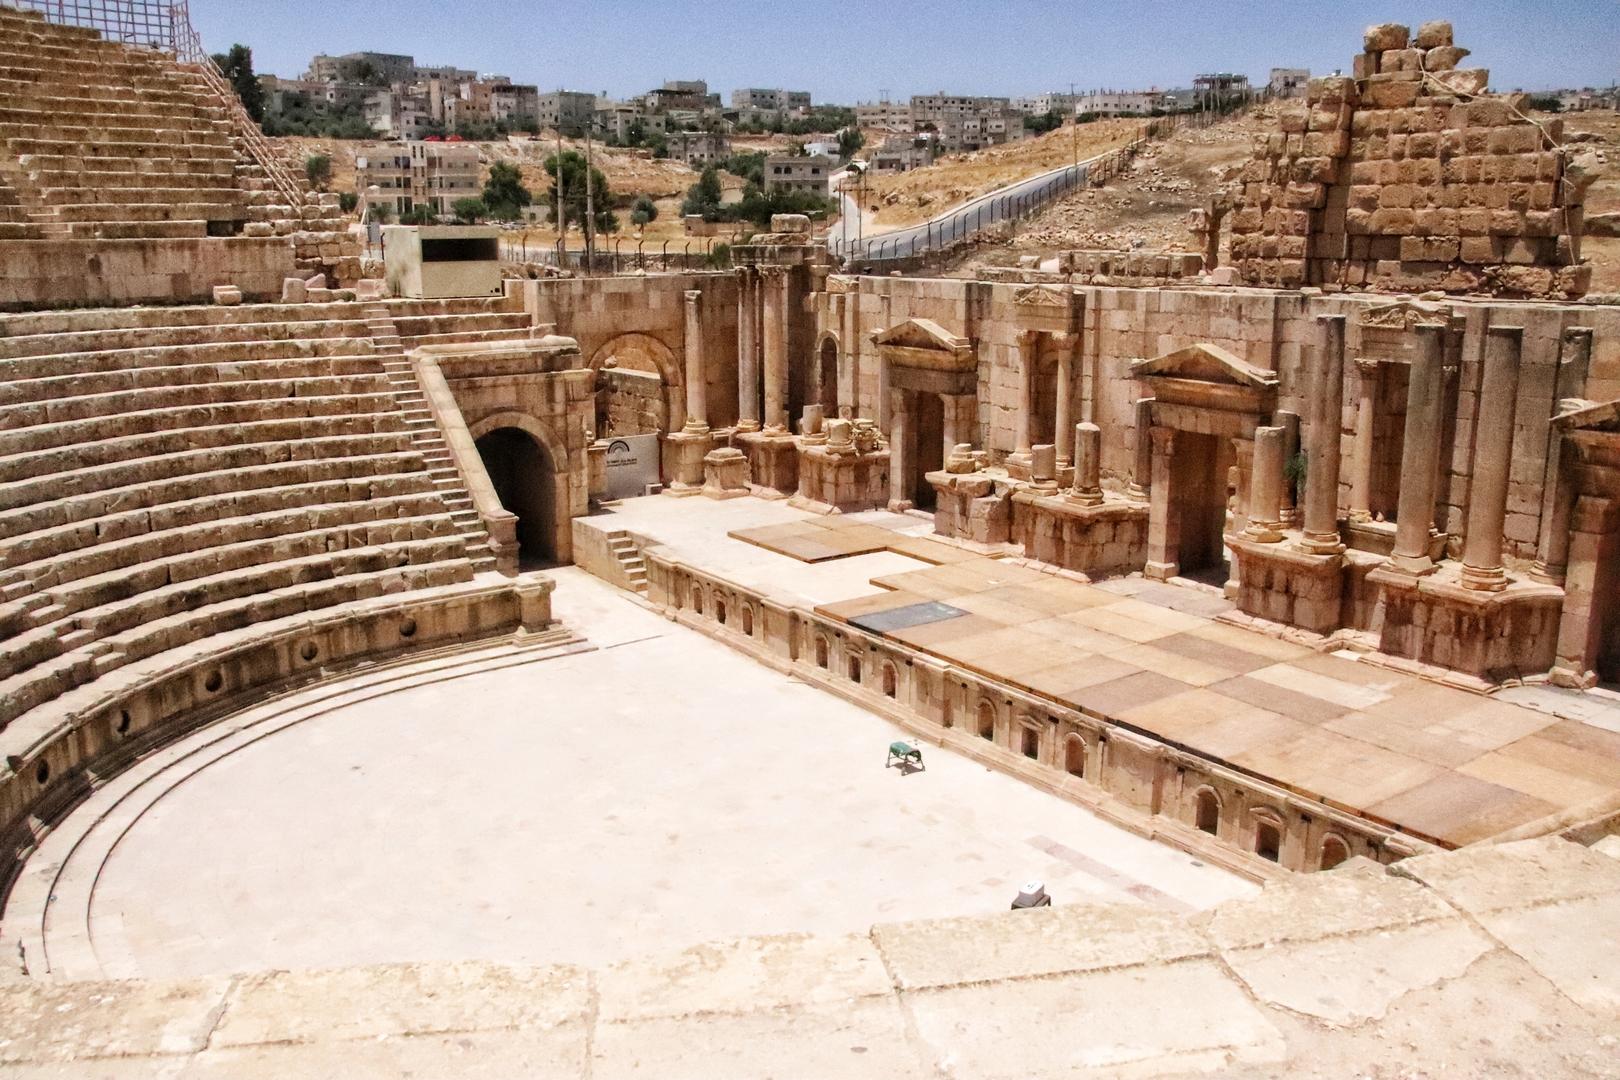 Jordanie - Théâtre romain à Jerash